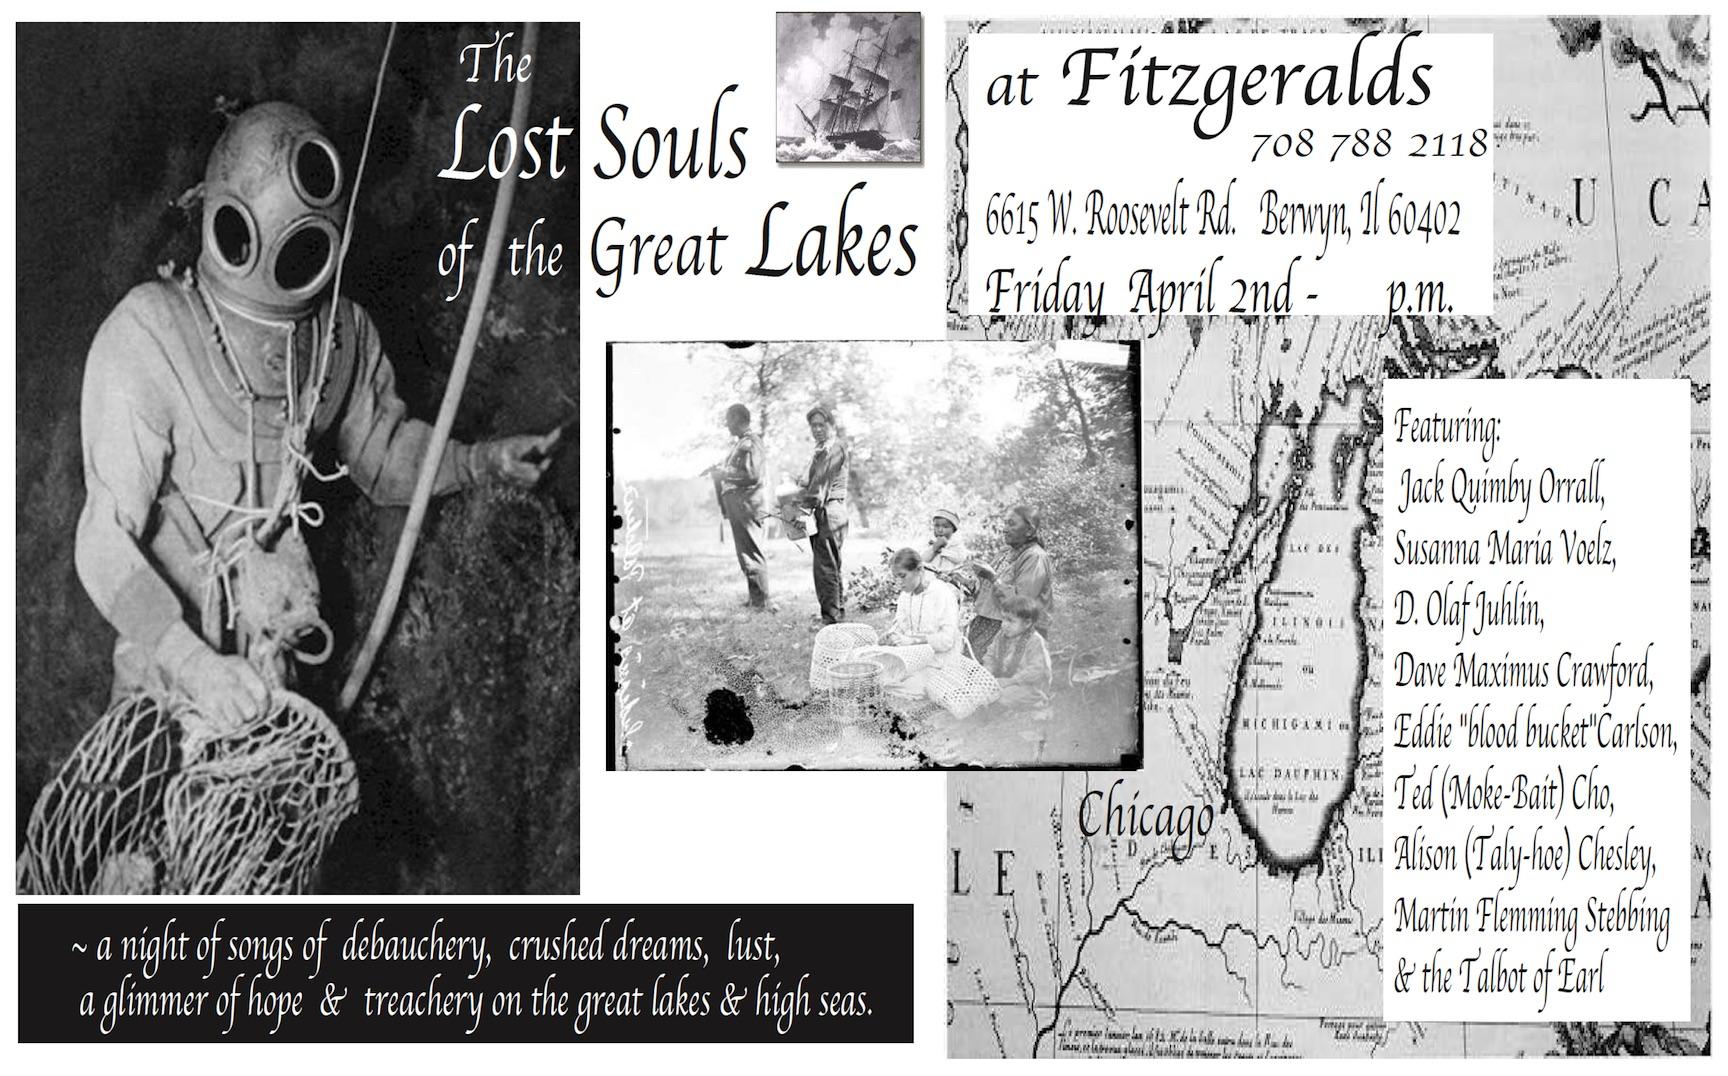 lost souls flyer FITZ jpg 1.jpg